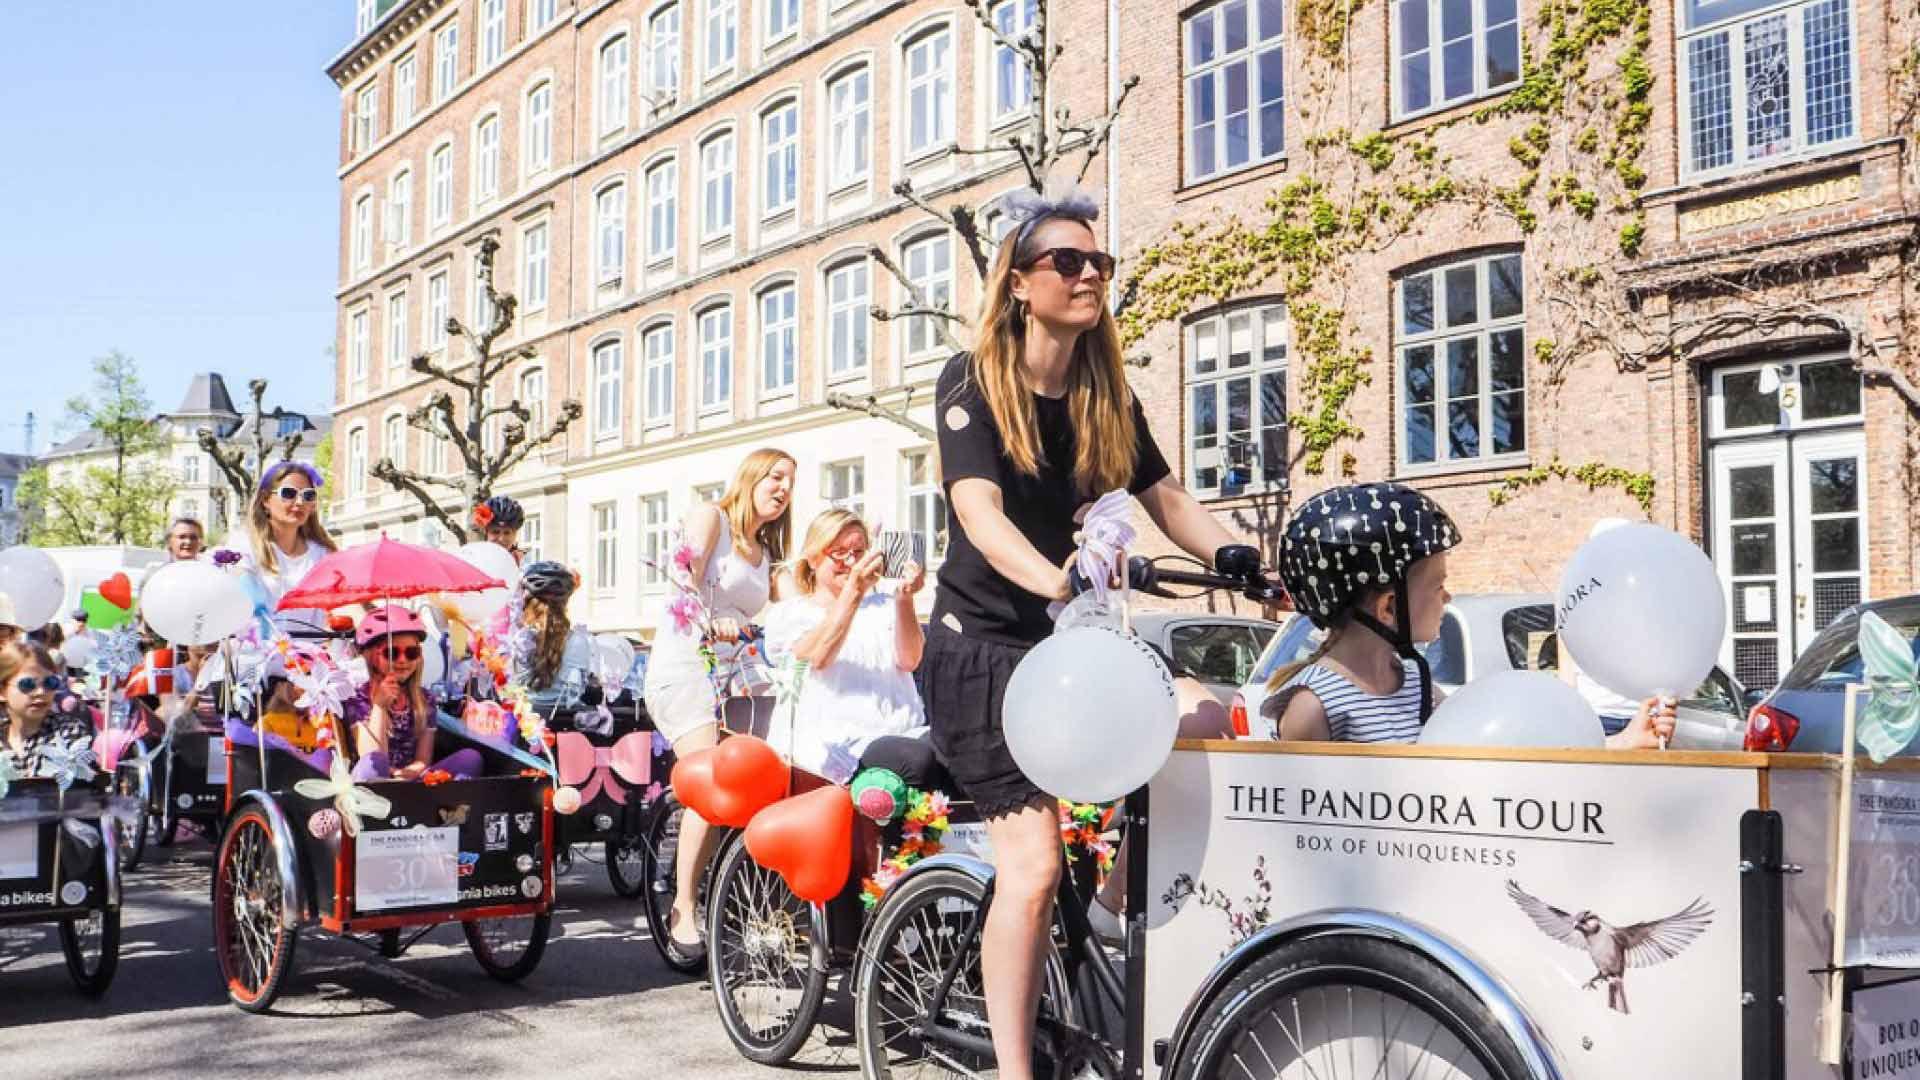 kassecykler til Pandora cykel tour